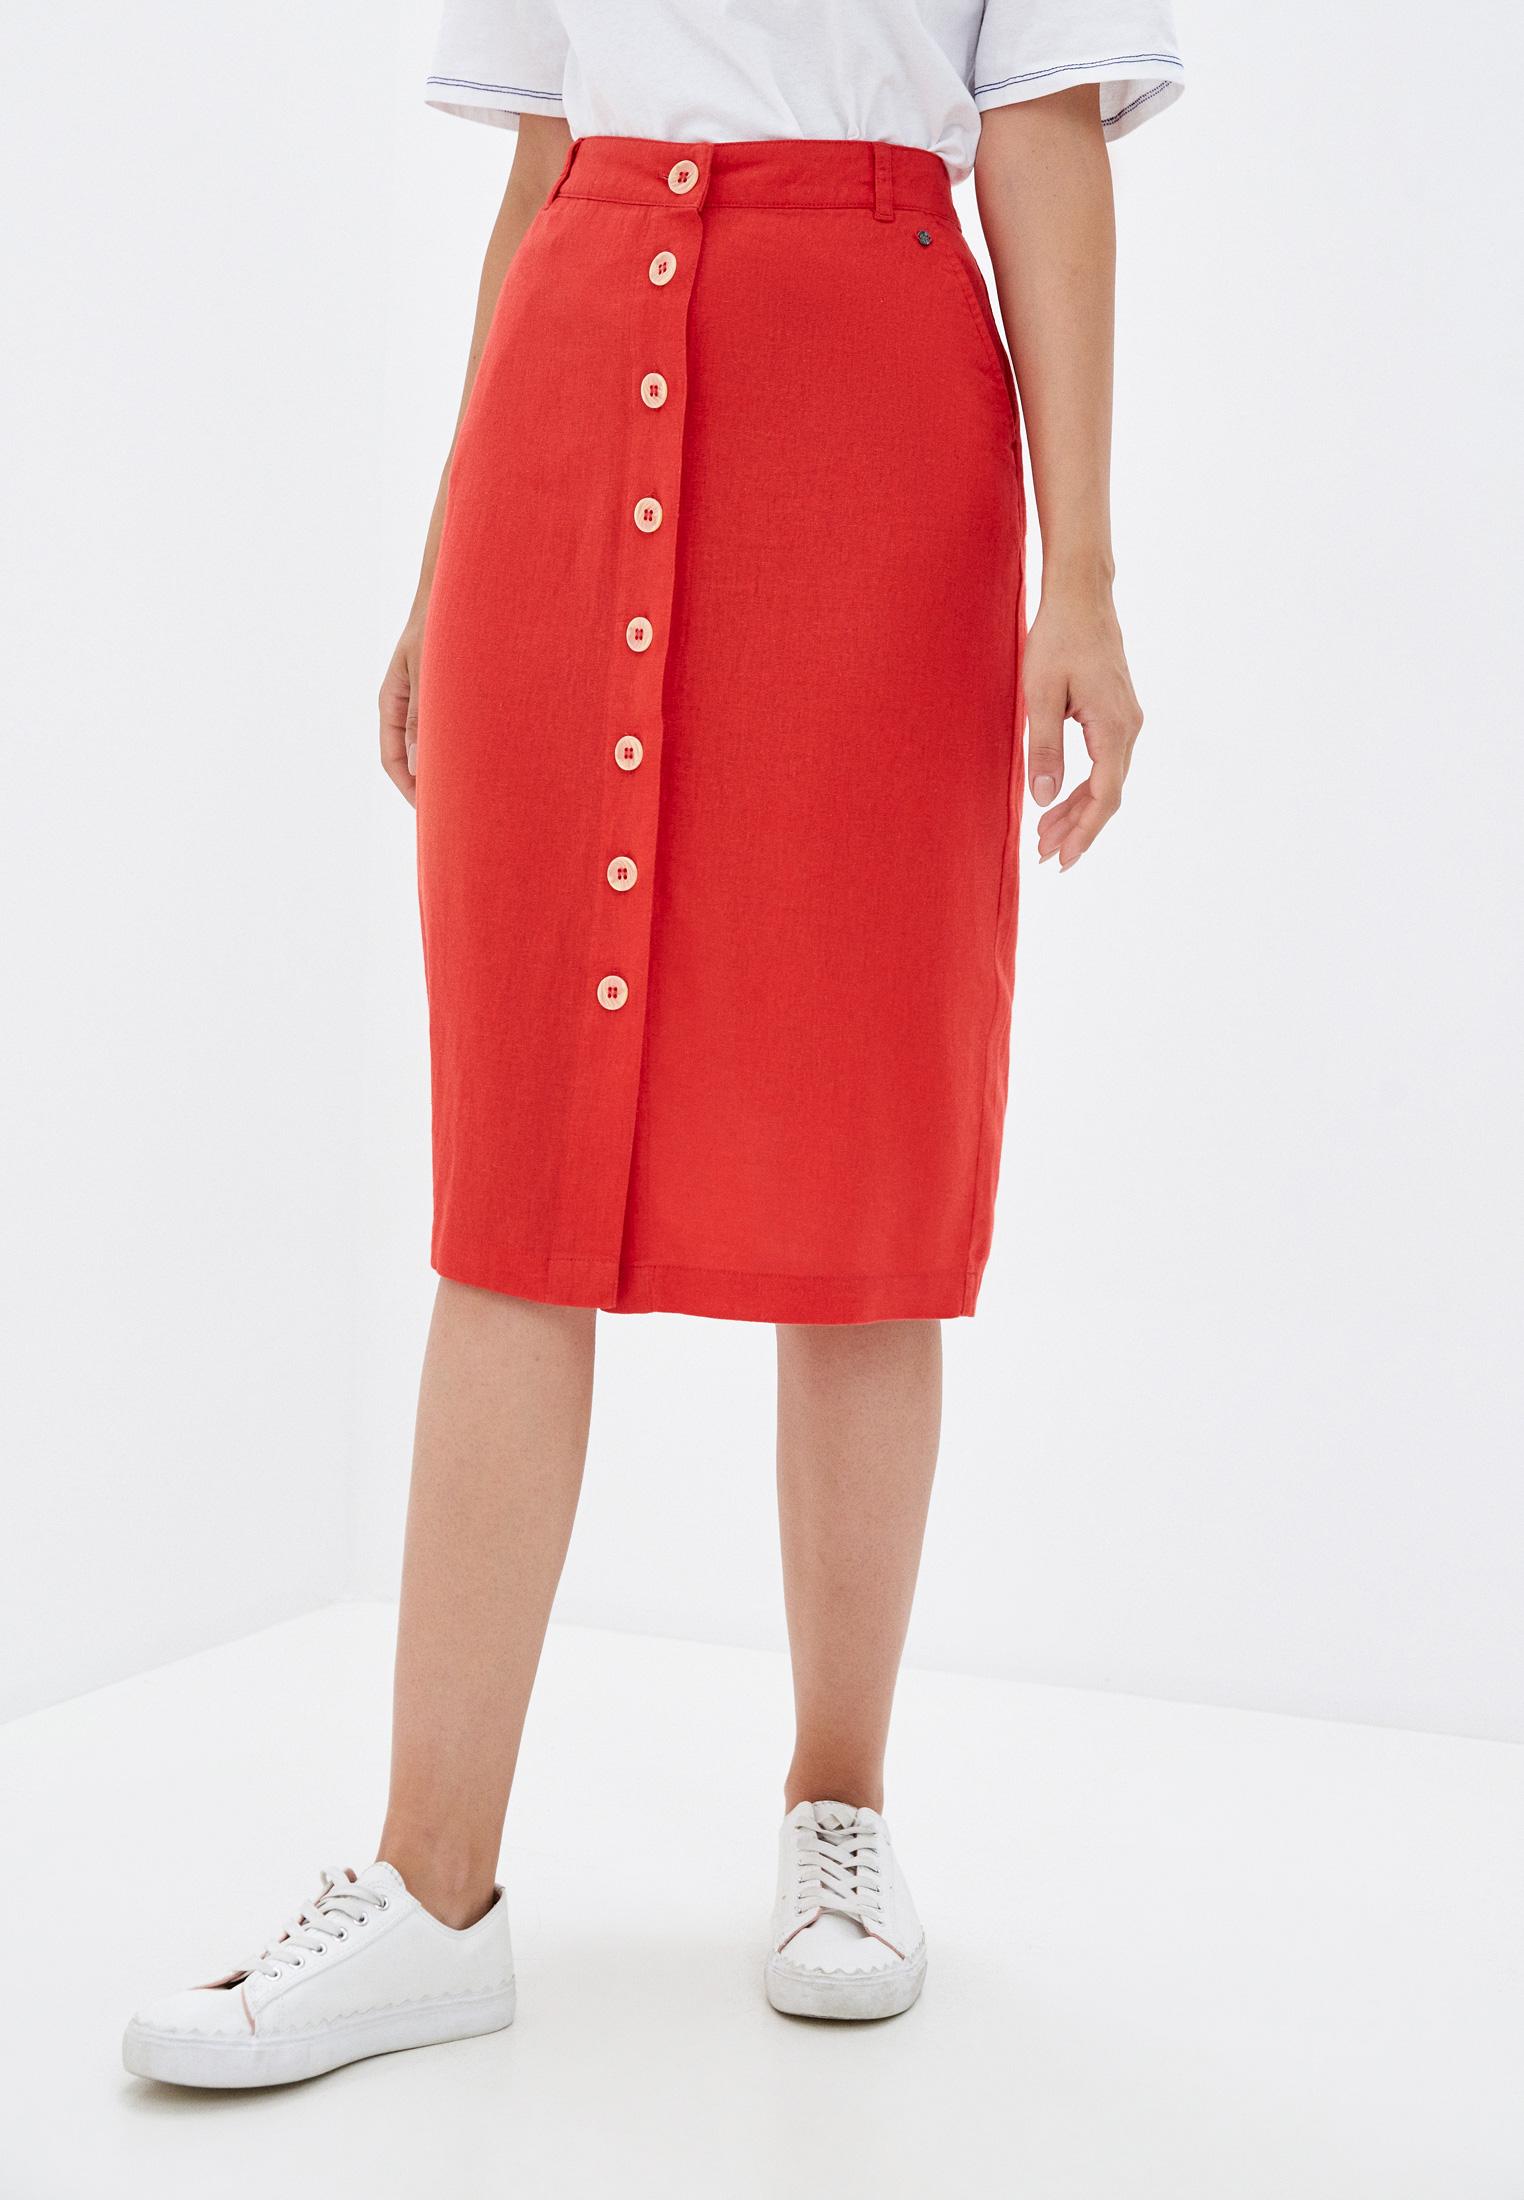 Прямая юбка Finn Flare (Фин Флаер) S19-14081: изображение 1